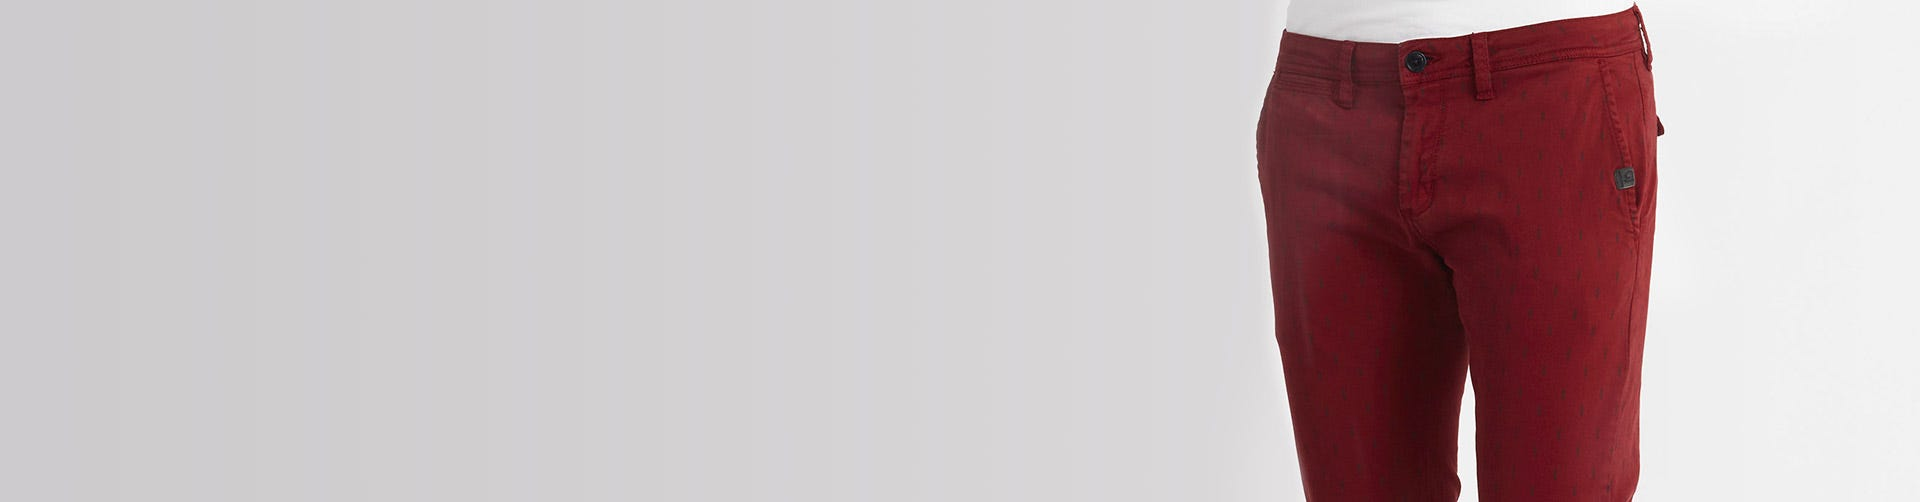 Elegantné a športové pánske nohavice – Gaudi 6f57a97b9f4